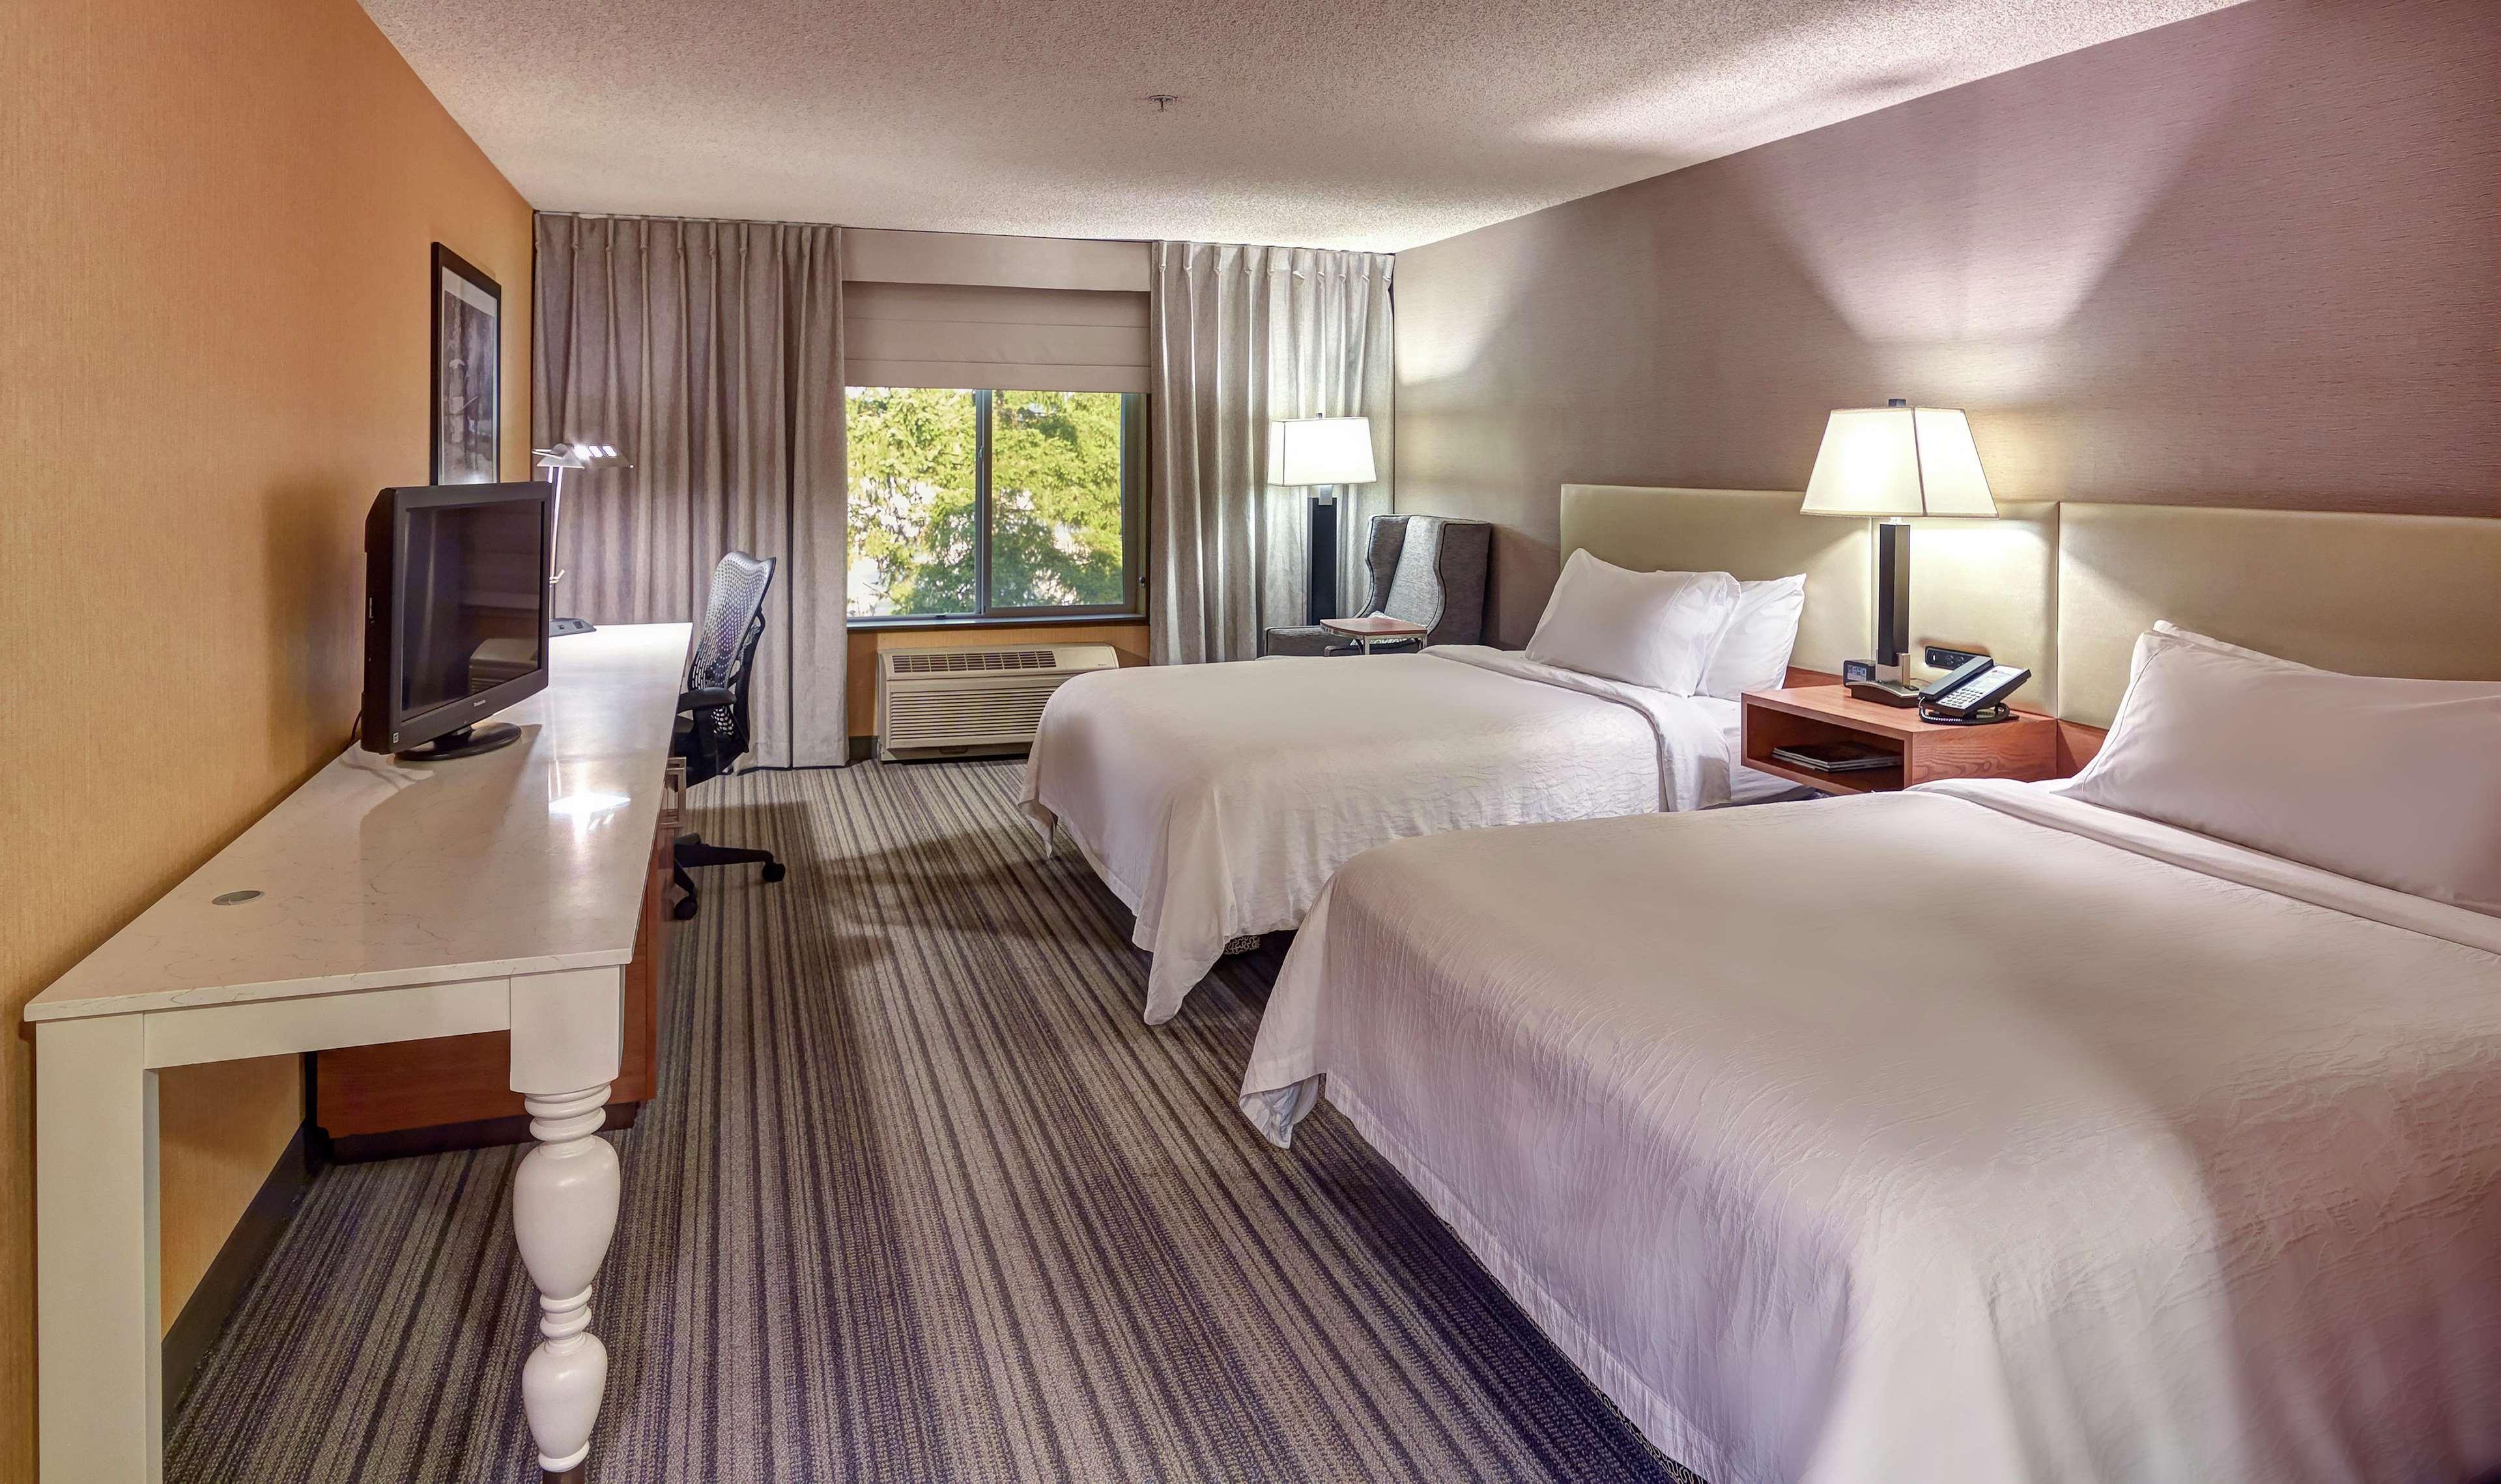 Hilton Garden Inn Portland/Beaverton